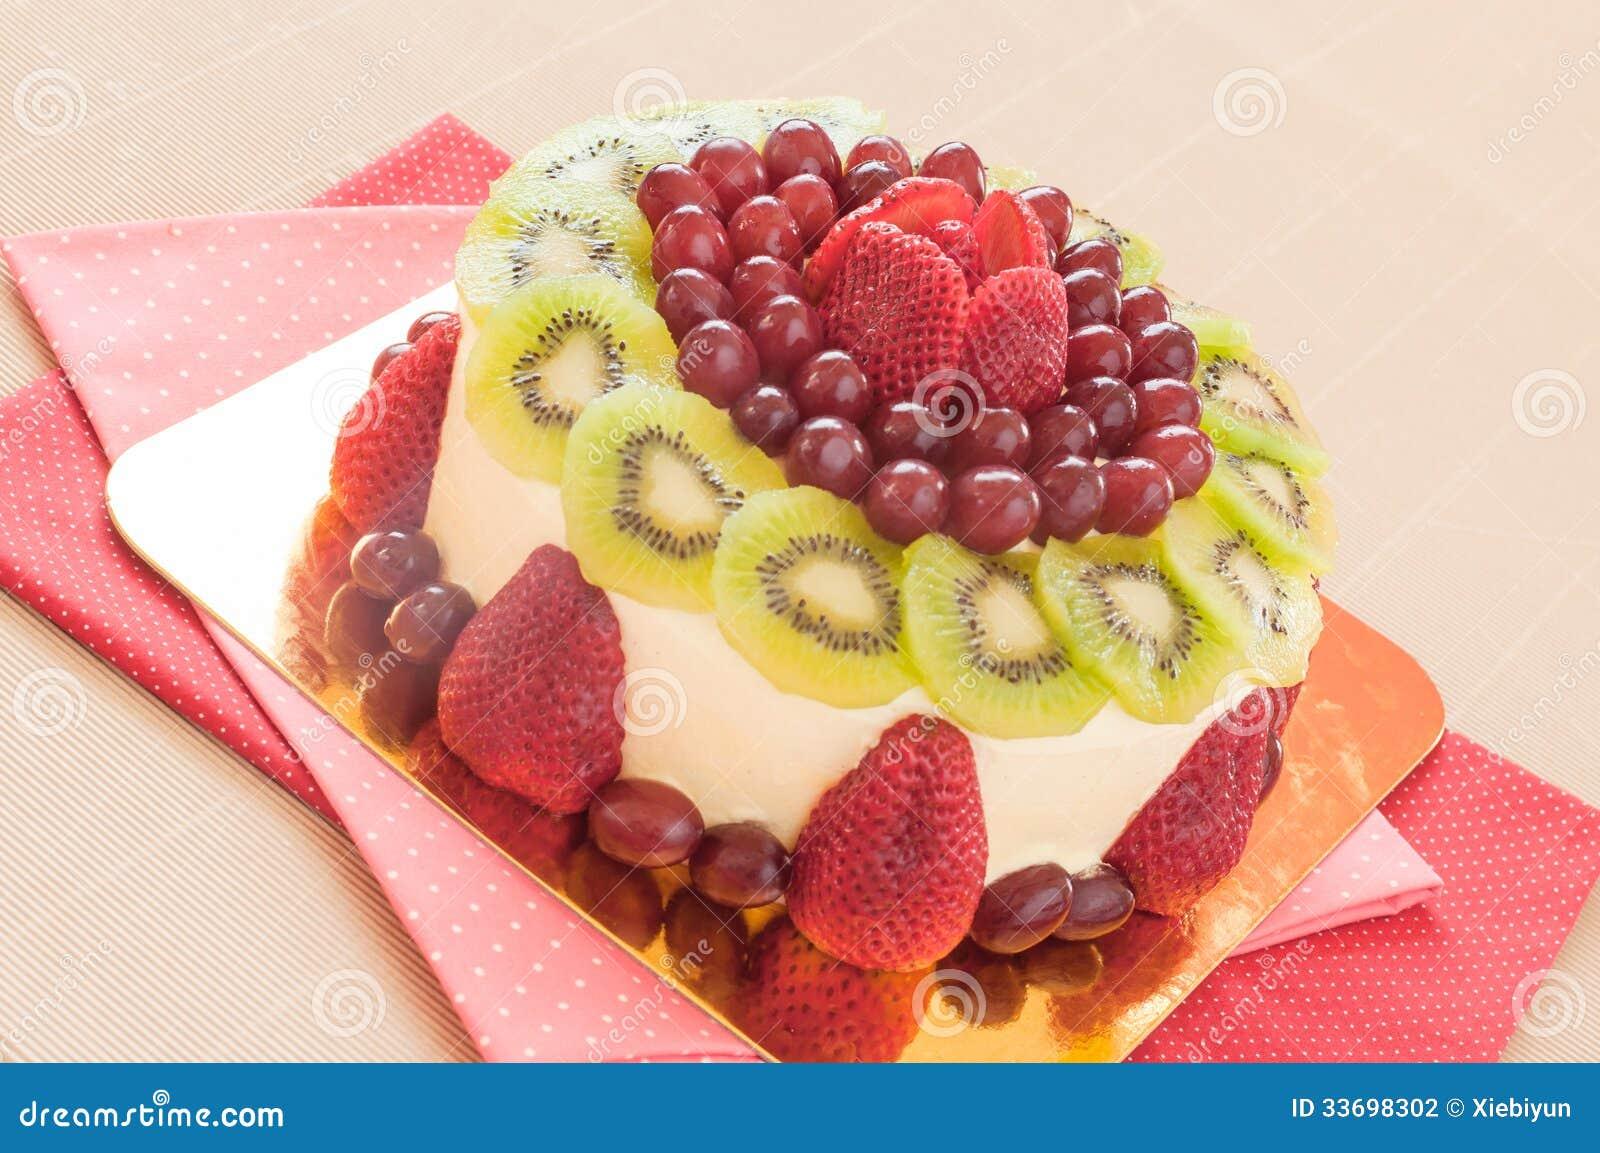 Fresh Berries Fruit Cake With Whipped Cream. Stock ...